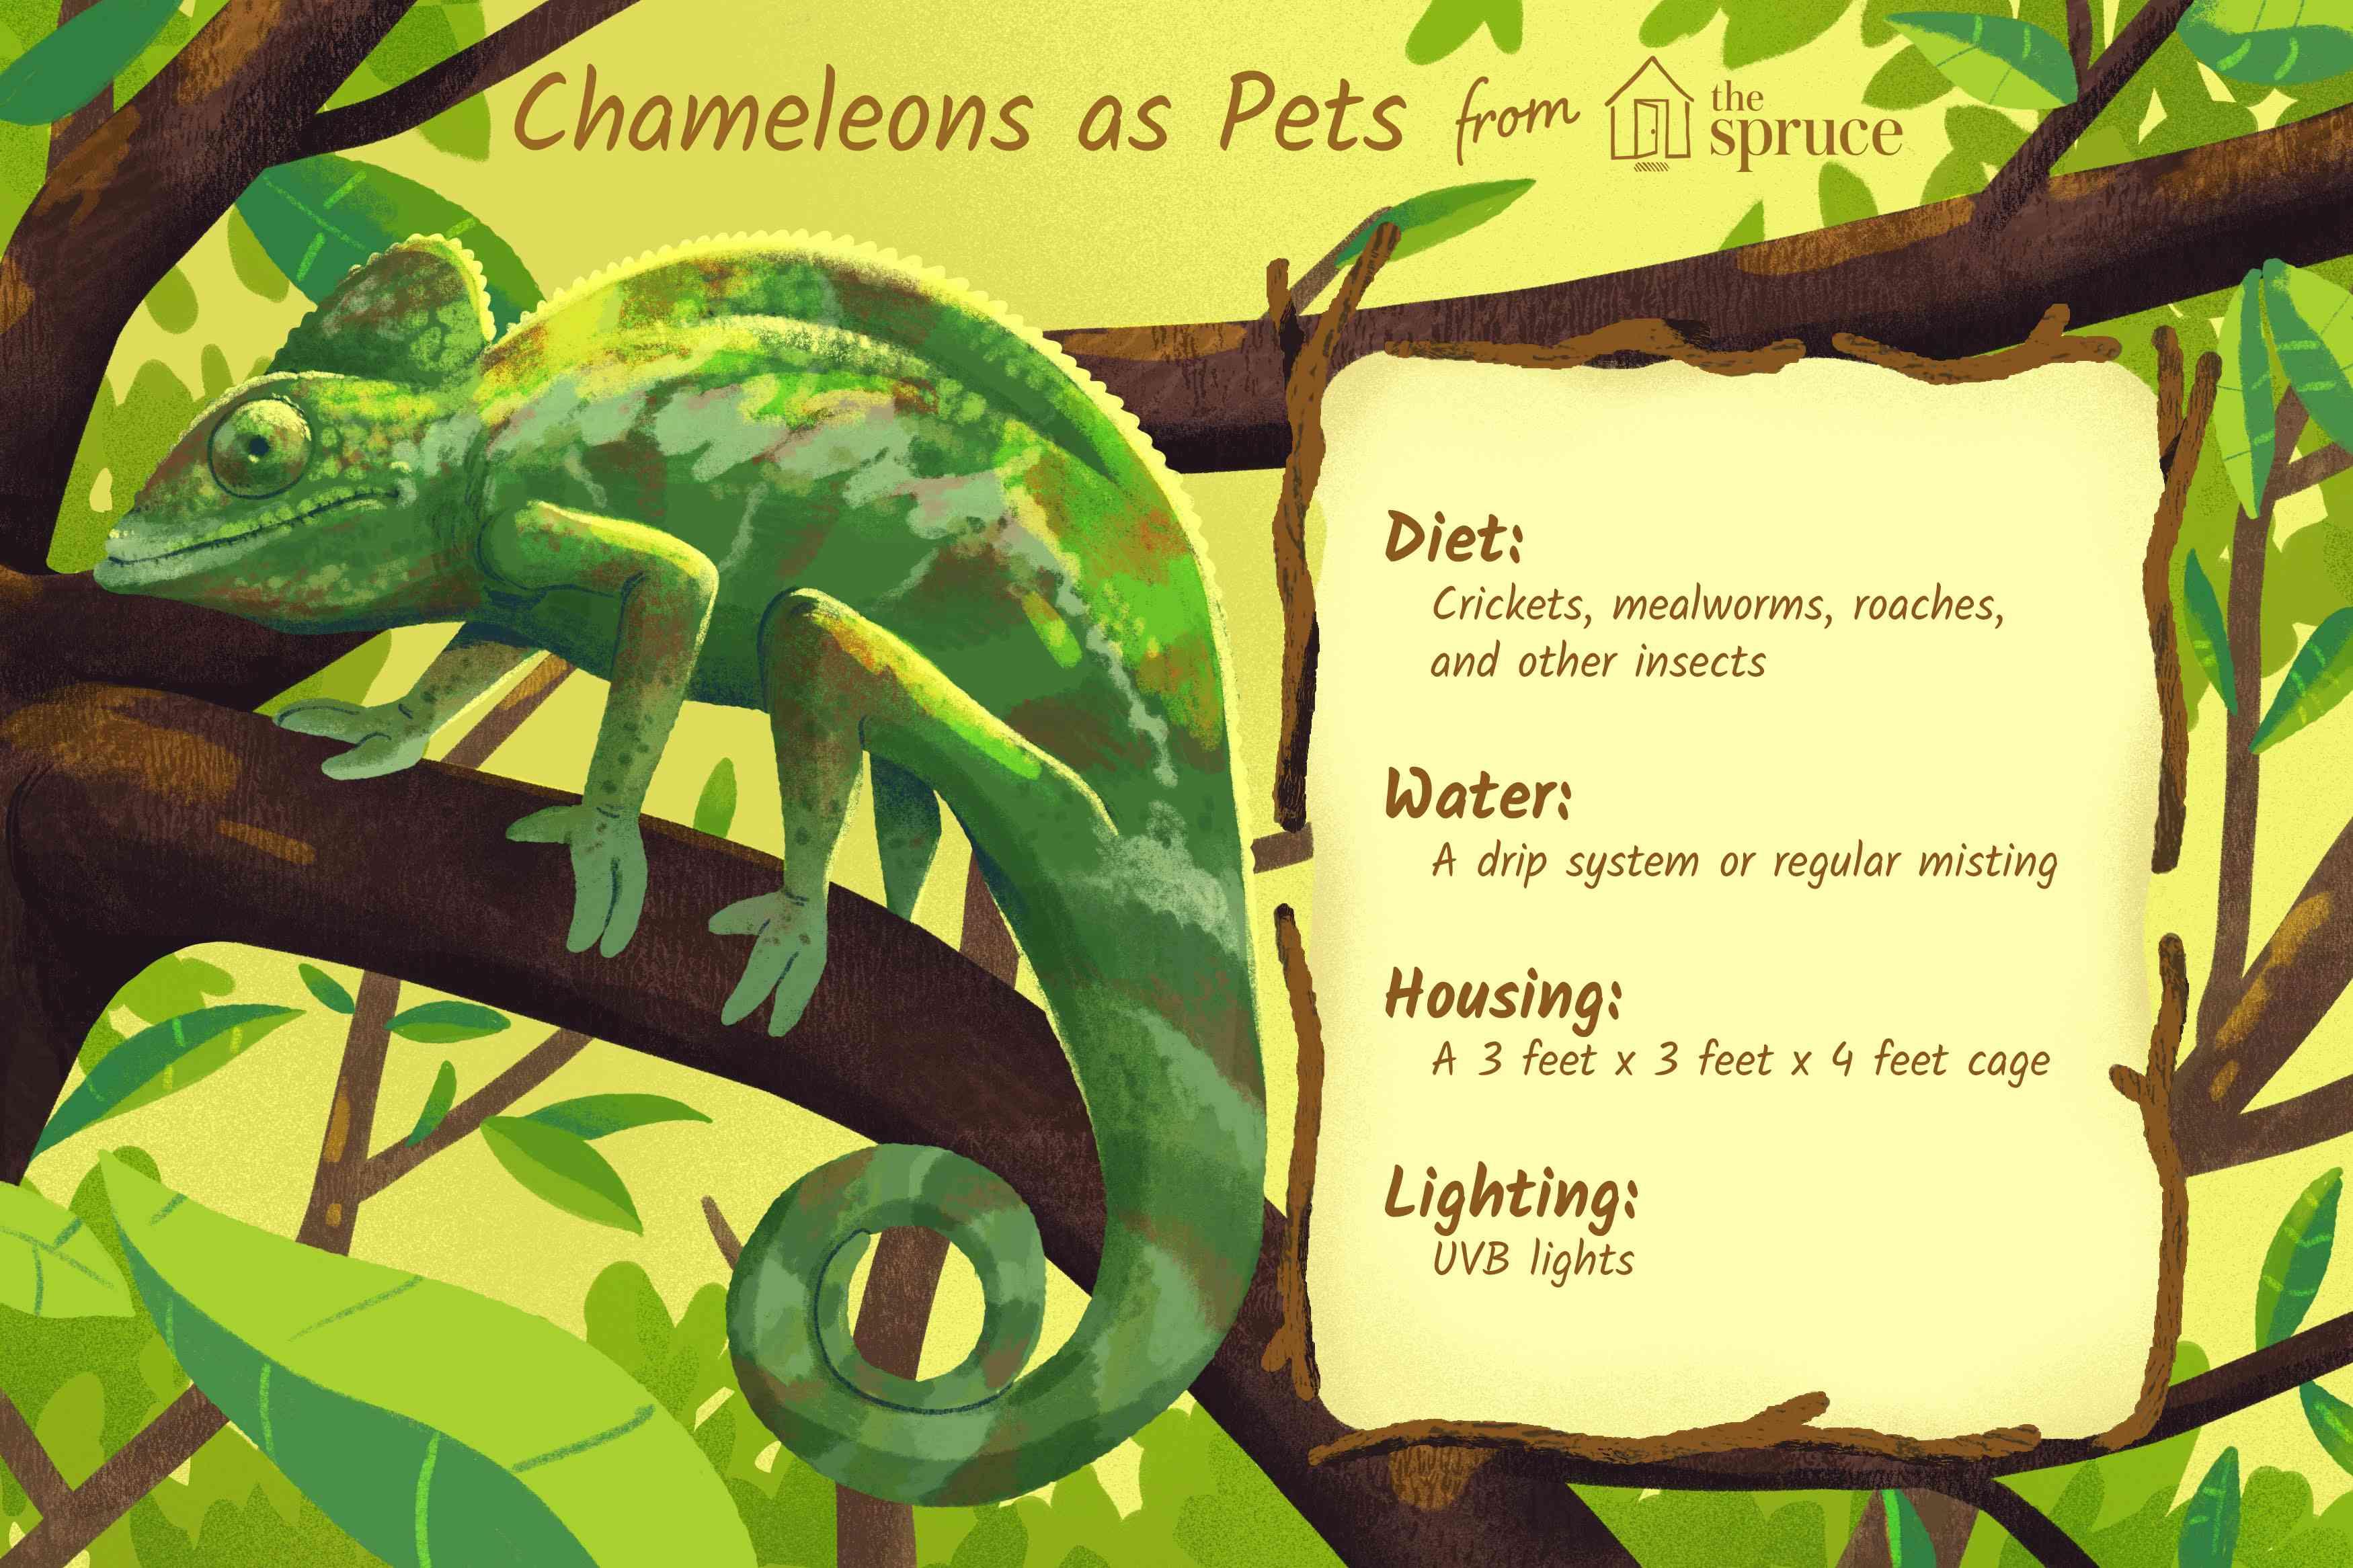 chameleons as pets illustration